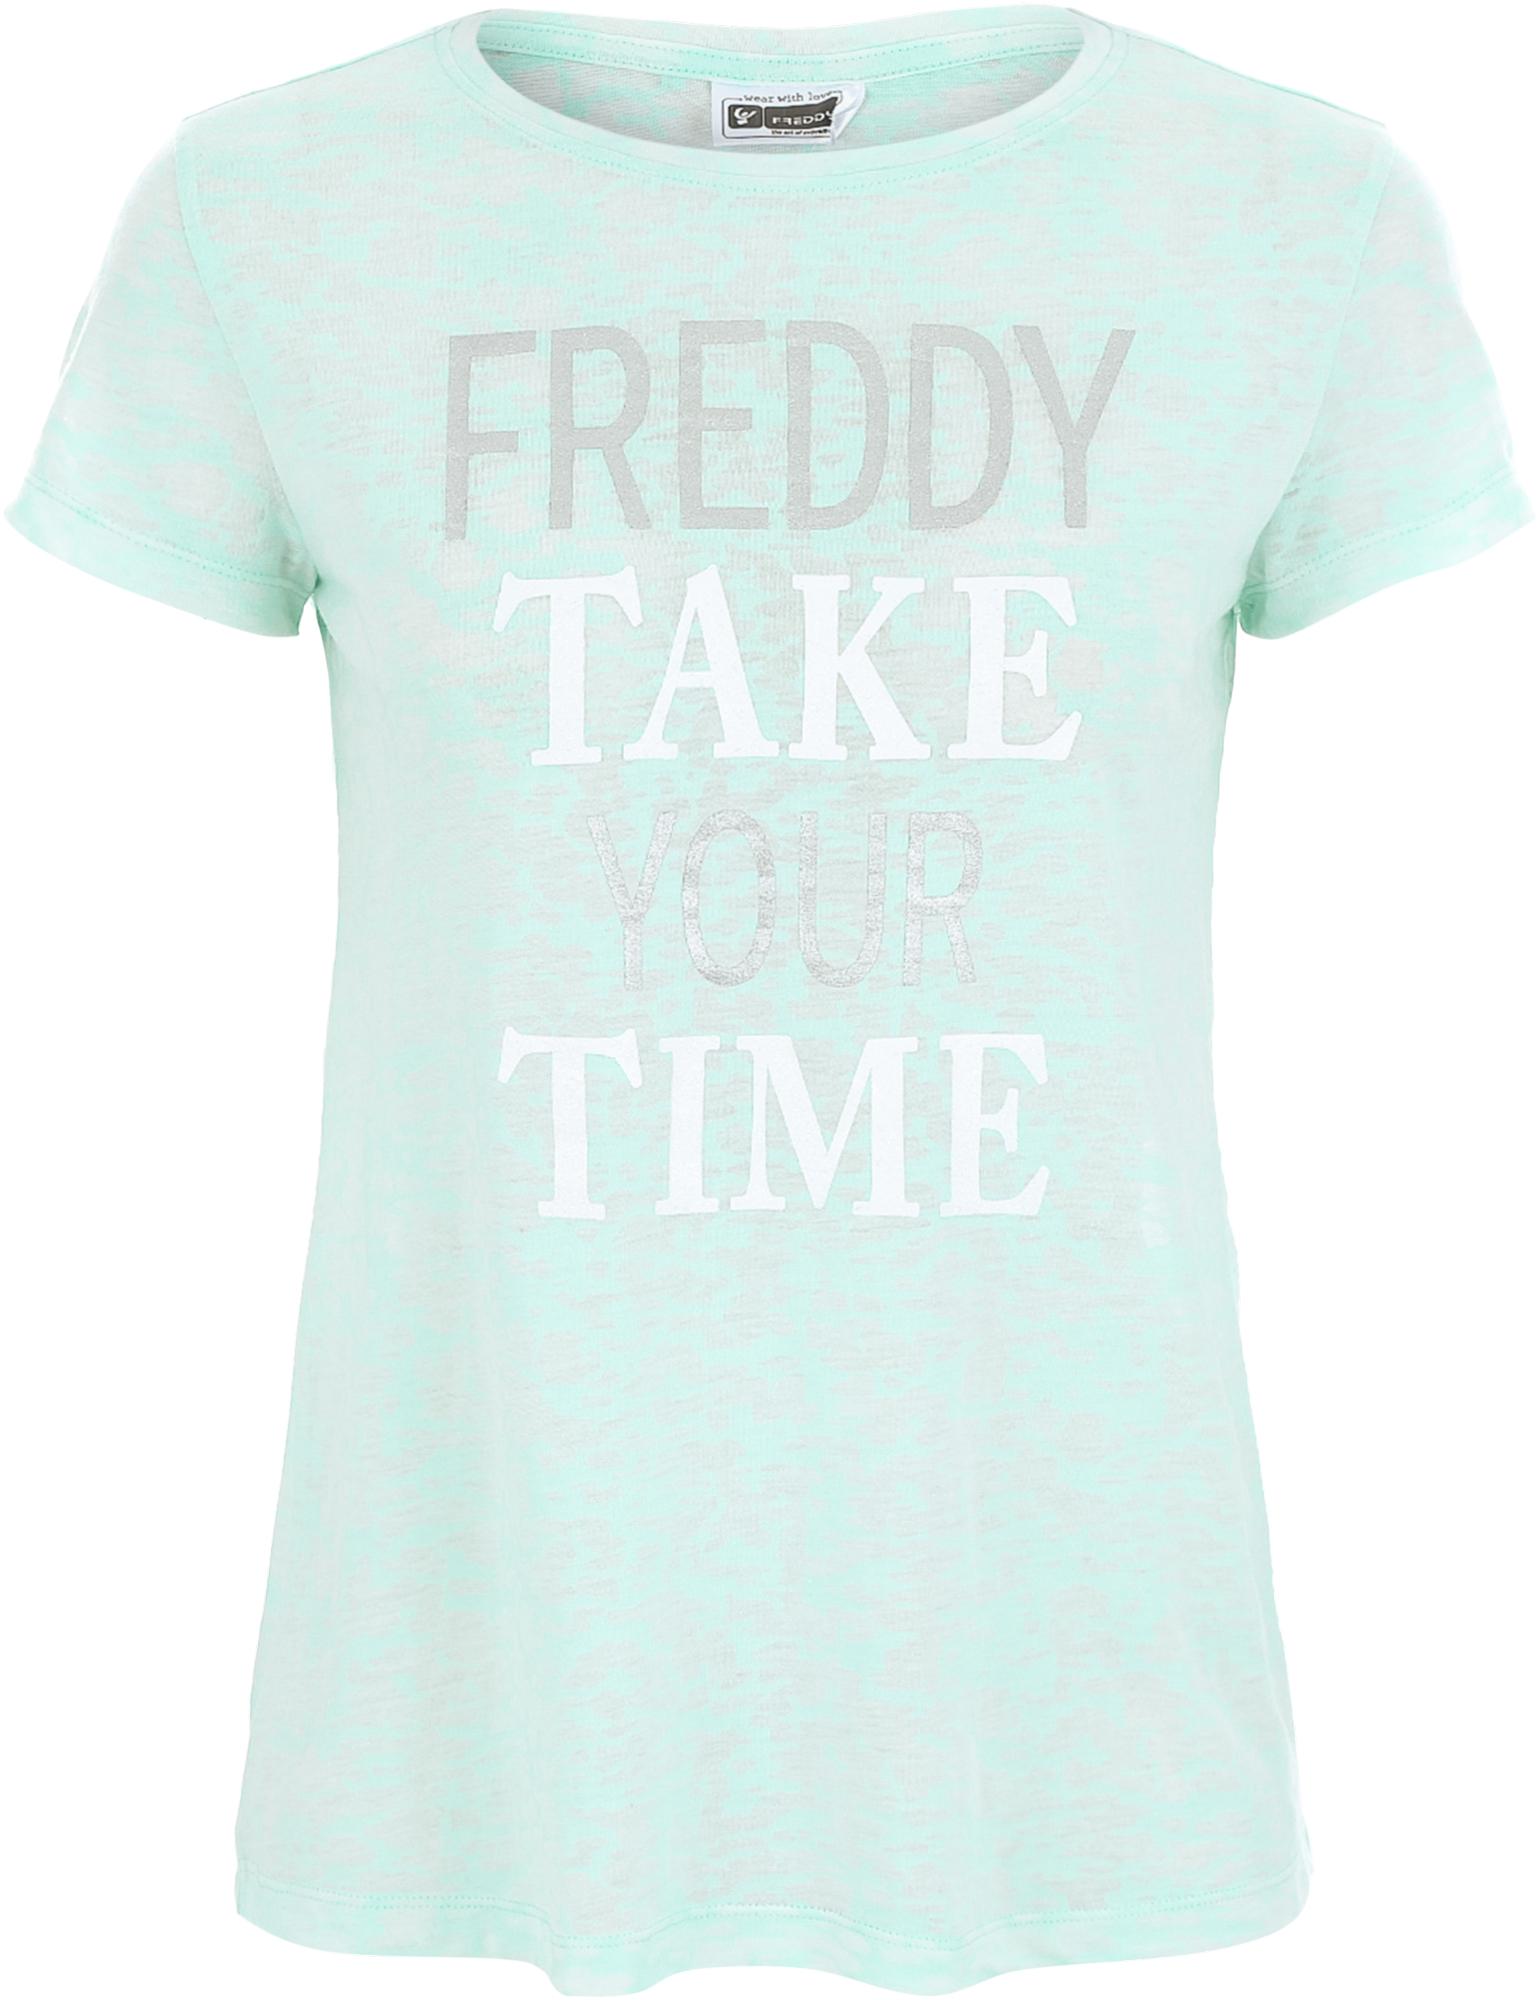 Freddy Футболка женская Freddy College, размер 48-50 недорго, оригинальная цена